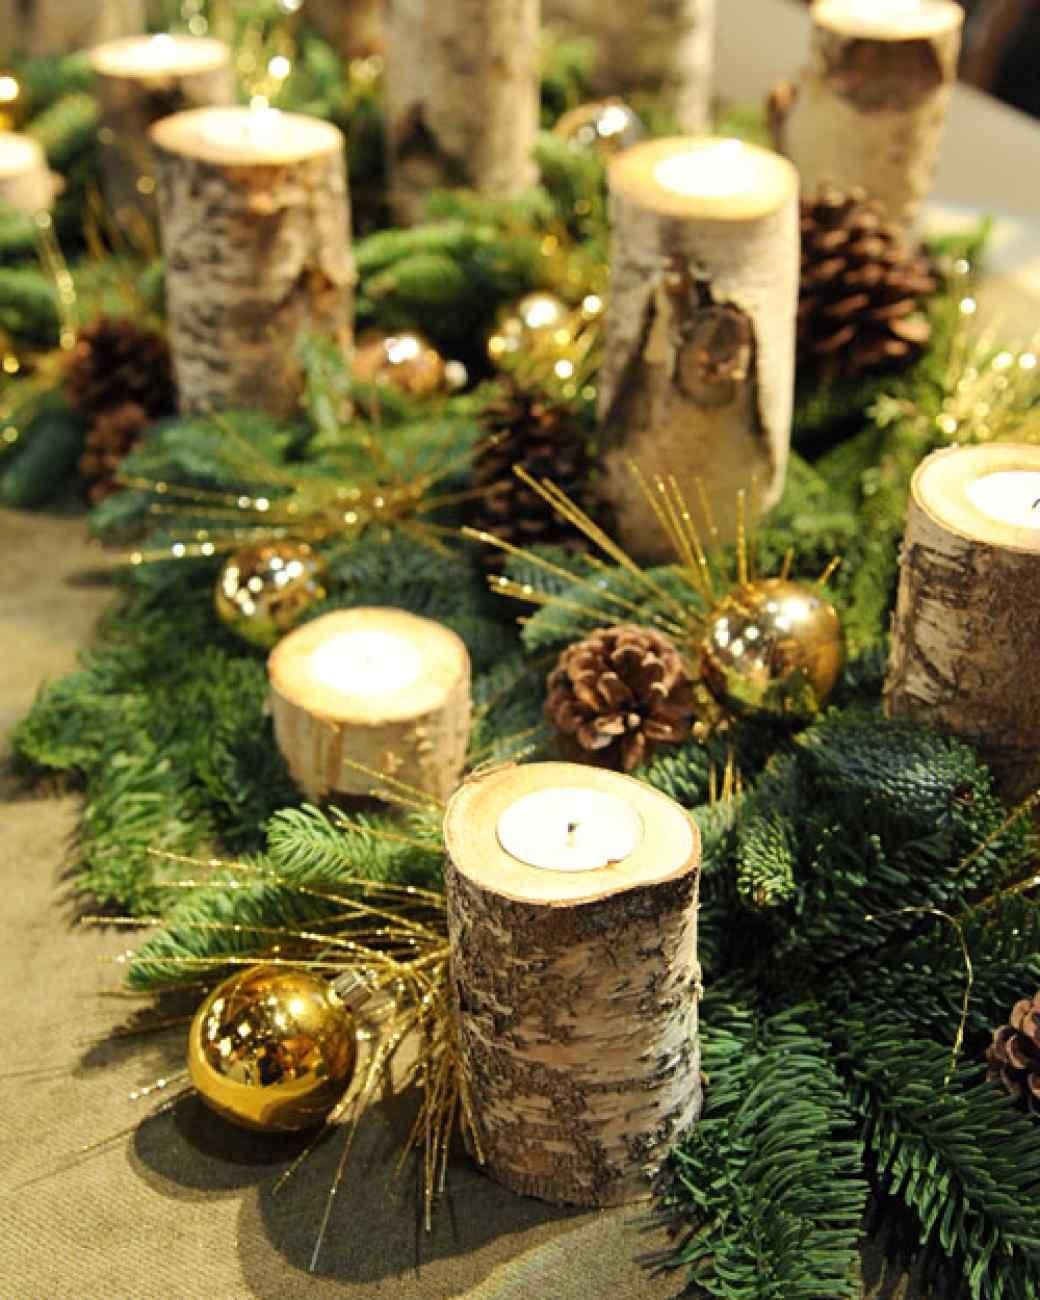 Birch Candles Christmas Centerpieces Christmas Table Decorations Christmas Decorations